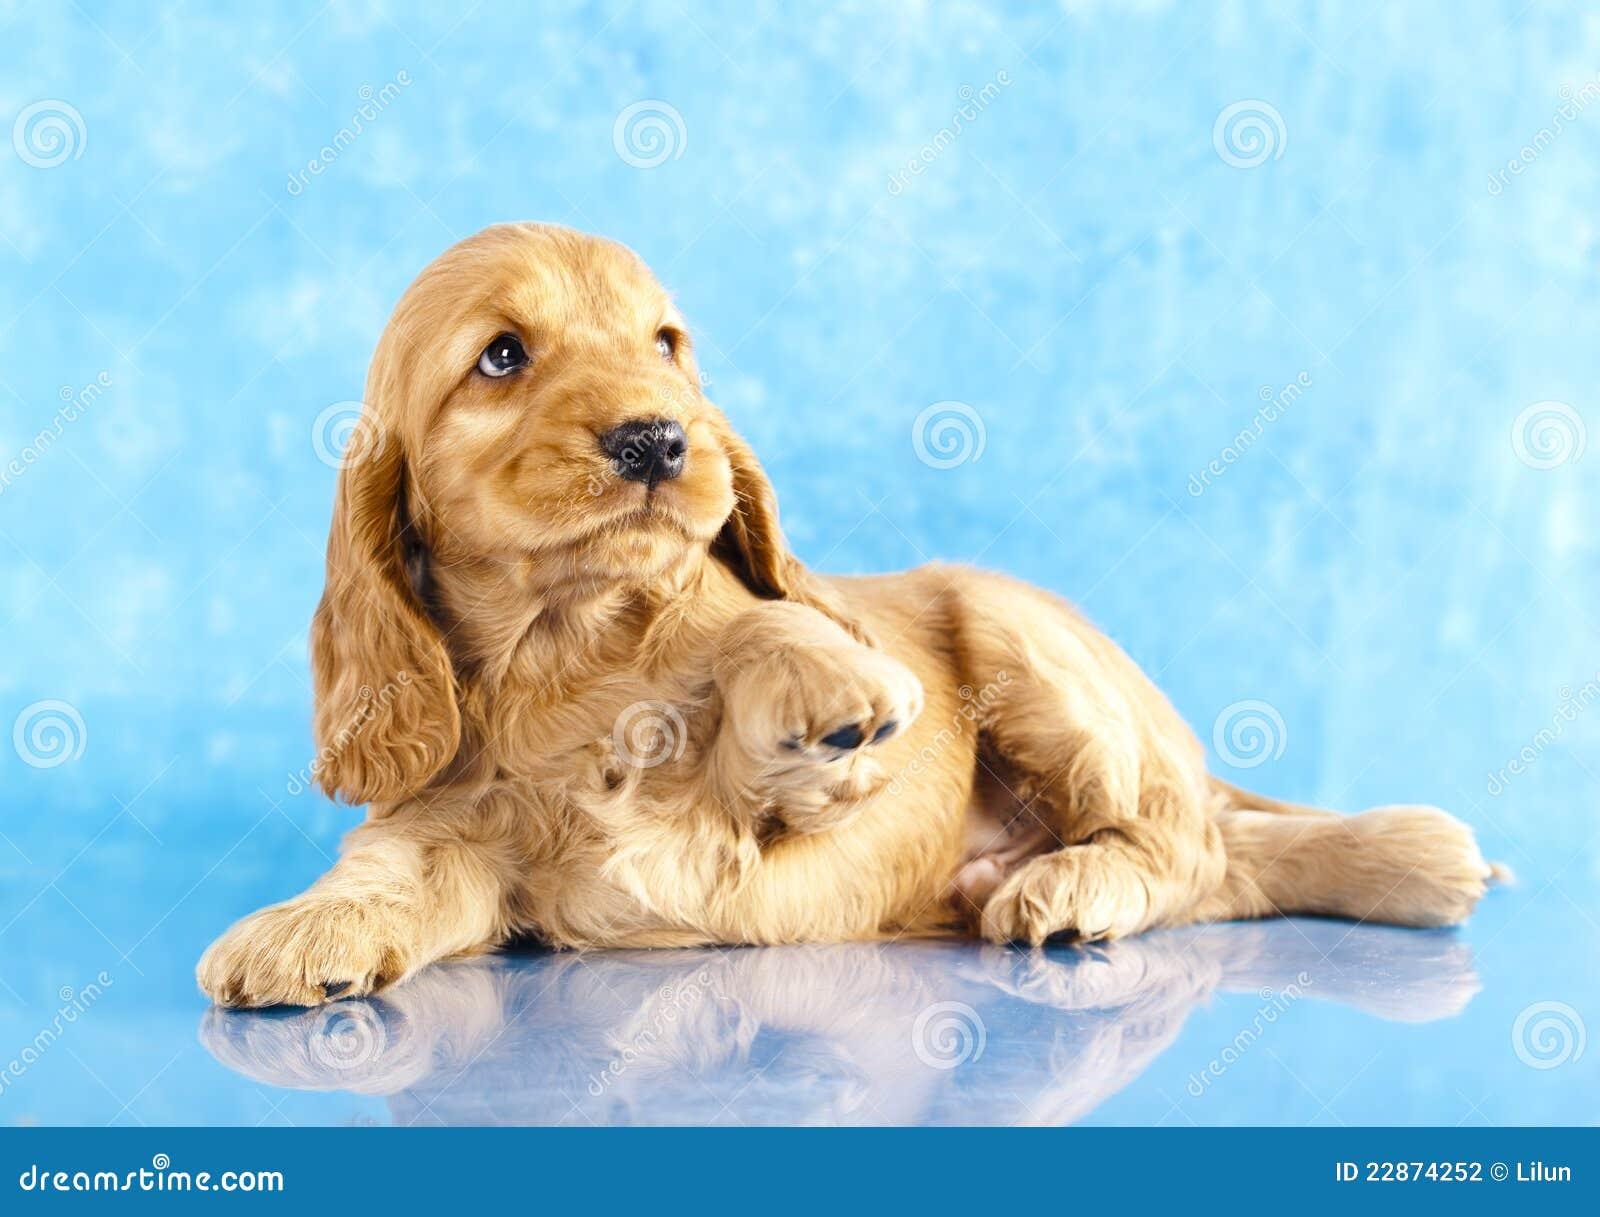 English Cocker Spaniel Puppy Stock Photo Image Of Friend Buff 22874252